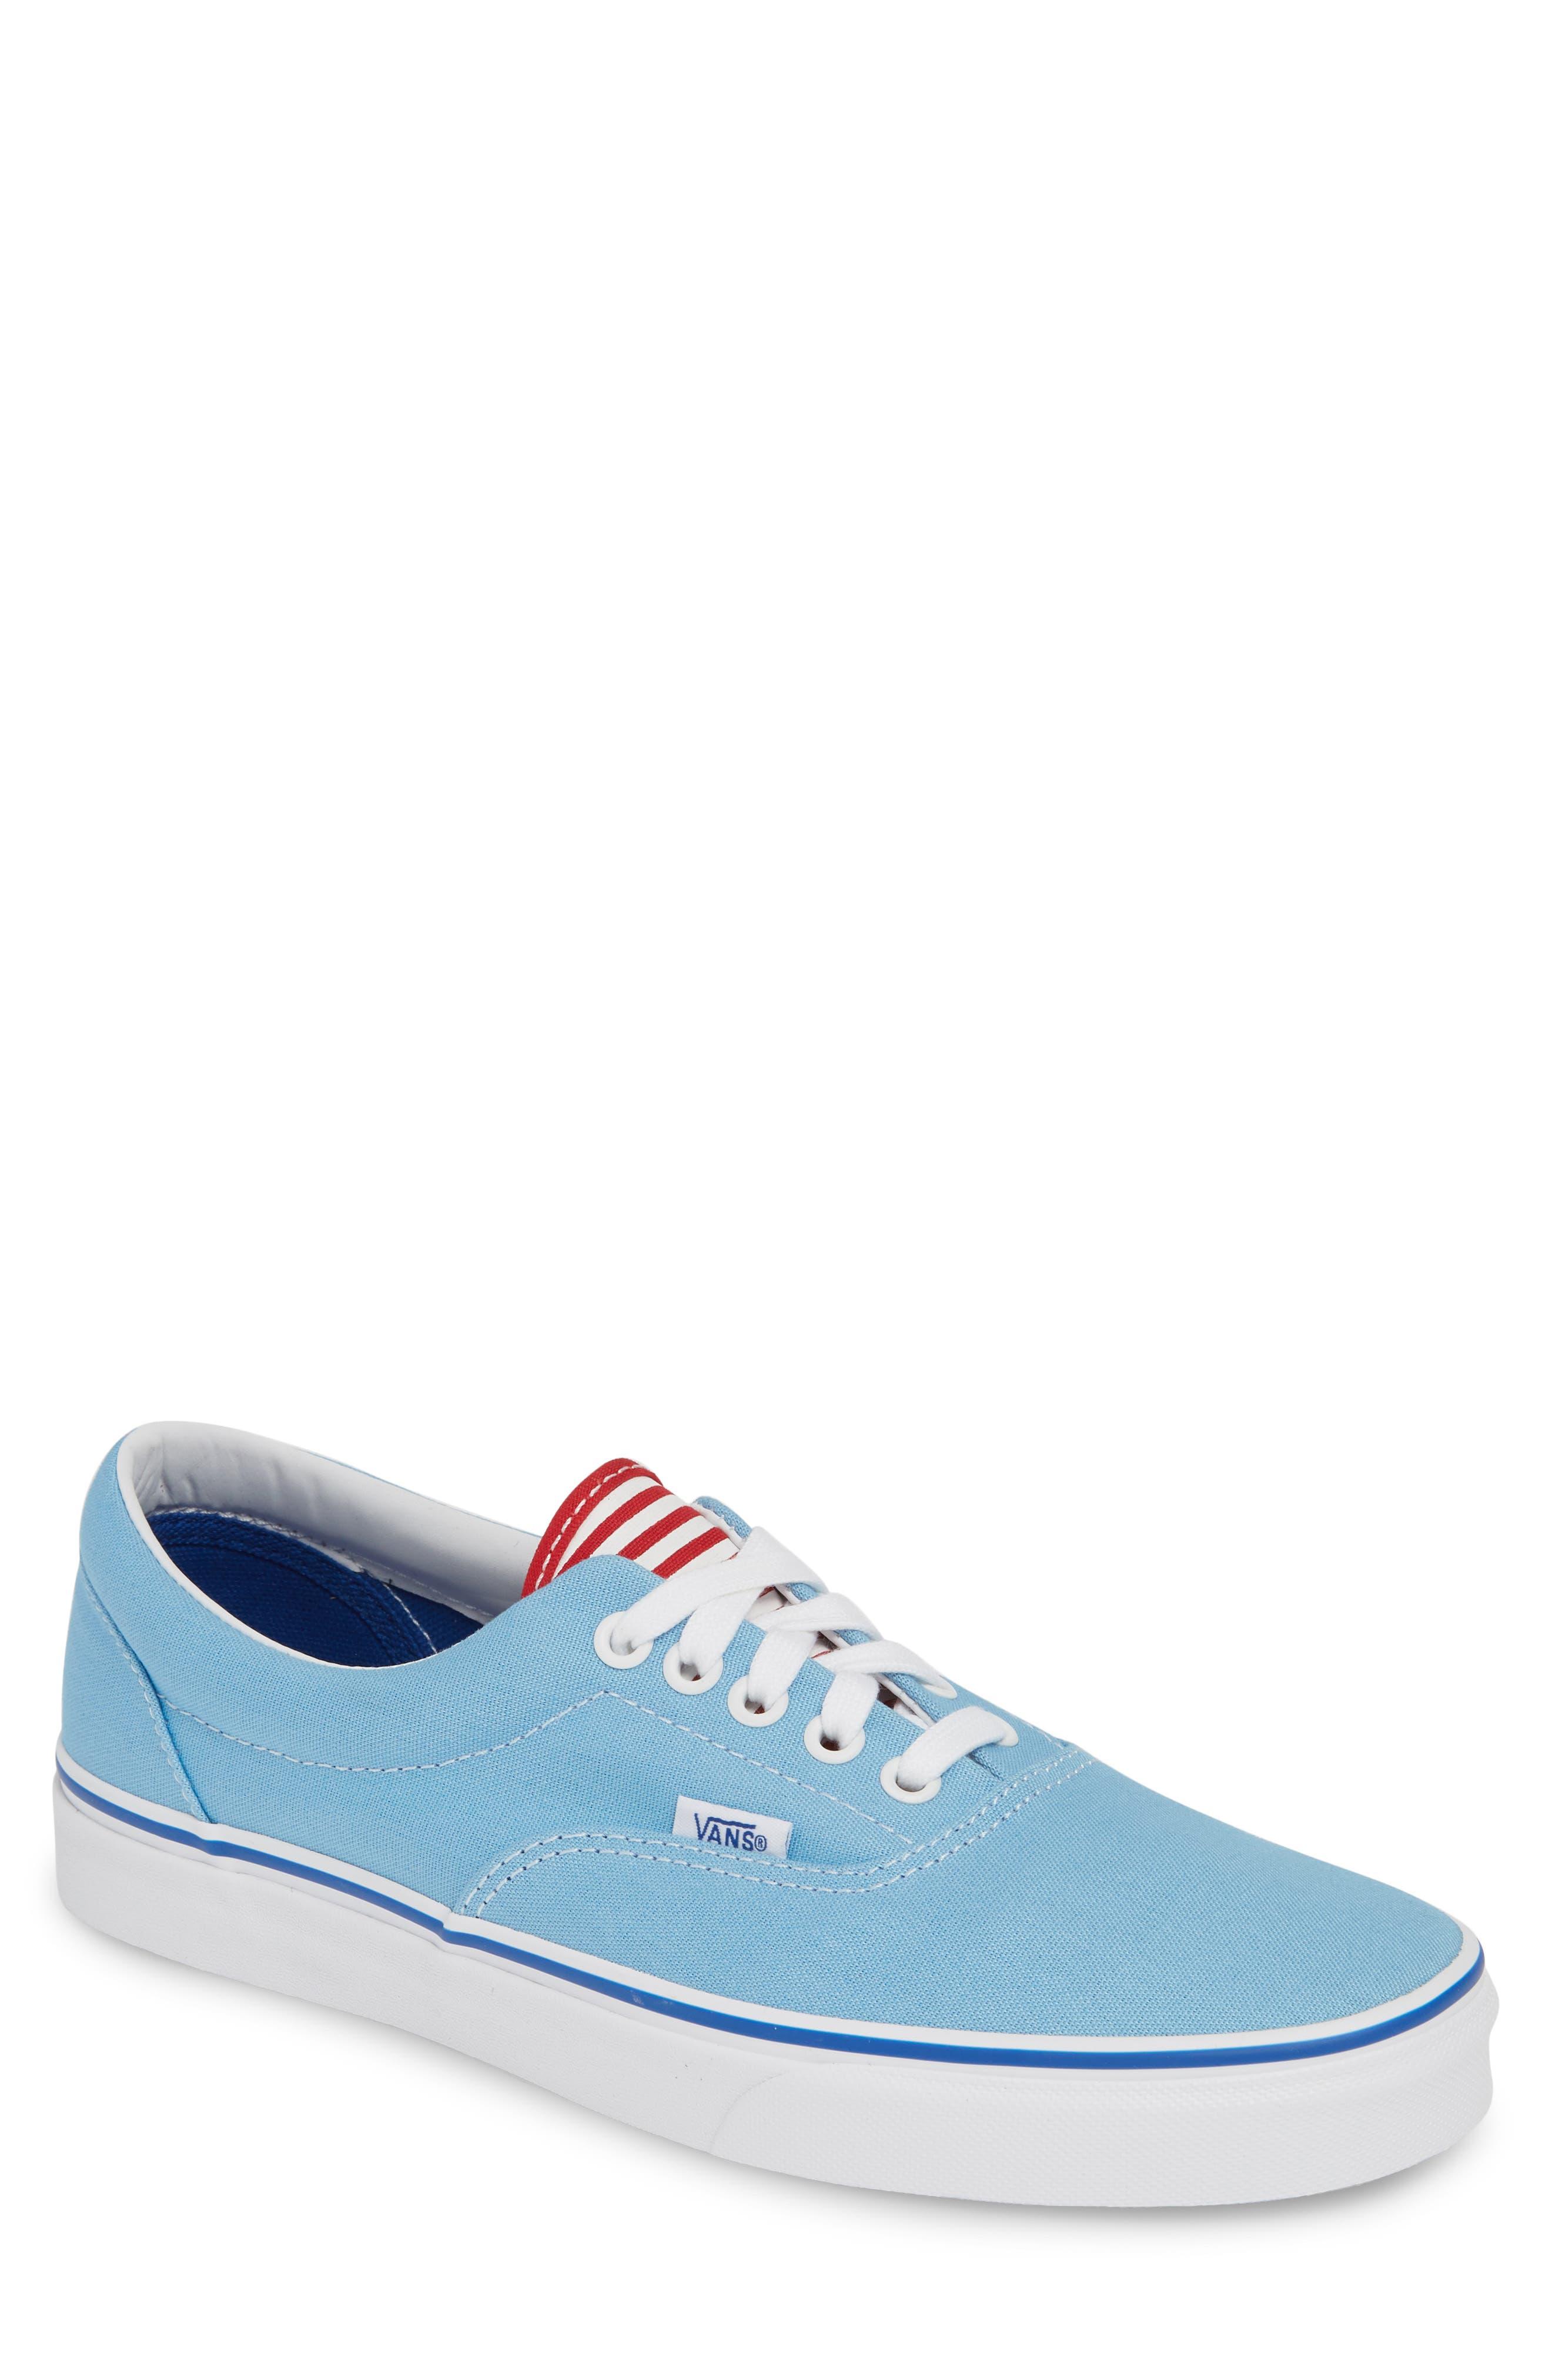 bb4fc0869b Vans Men s Shoes   Sneakers